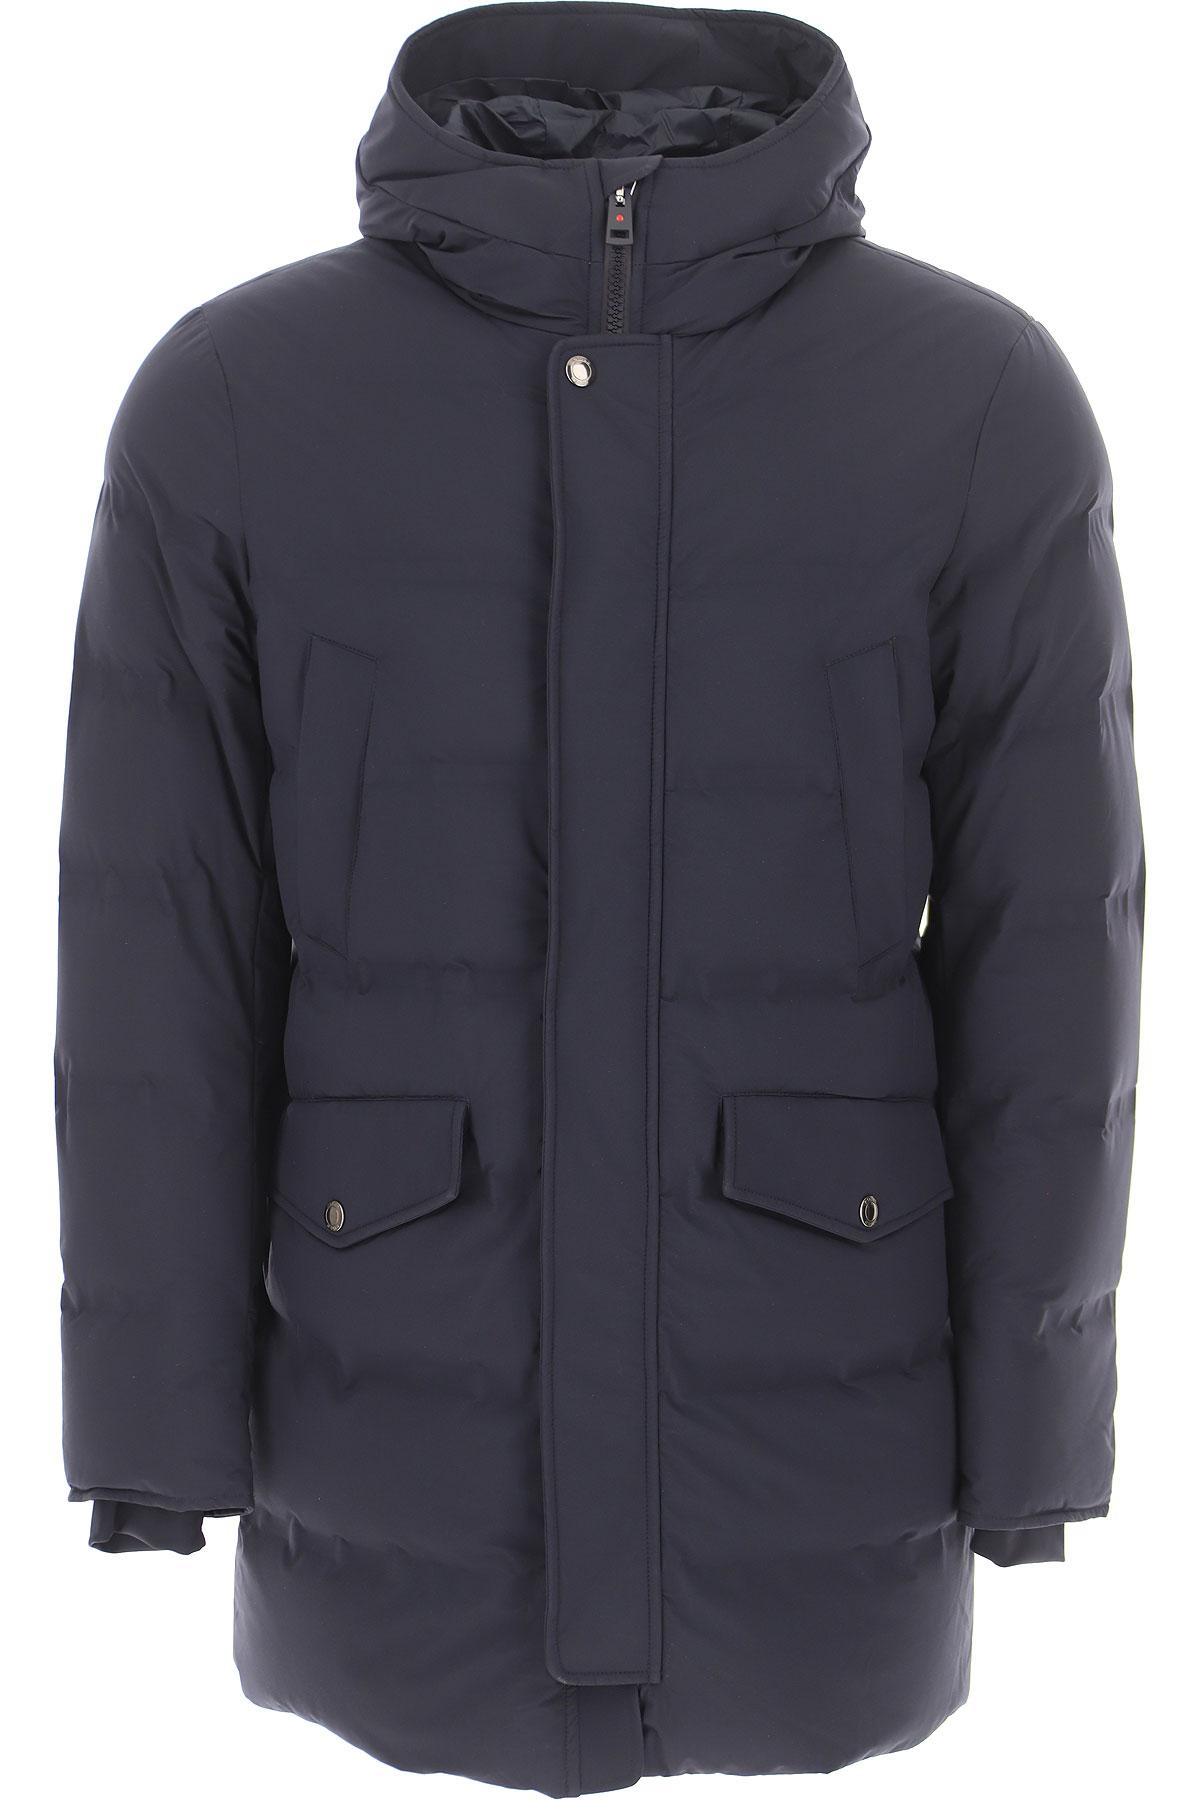 Kired Down Jacket for Men, Puffer Ski Jacket On Sale, navy, polyamide, 2019, L M